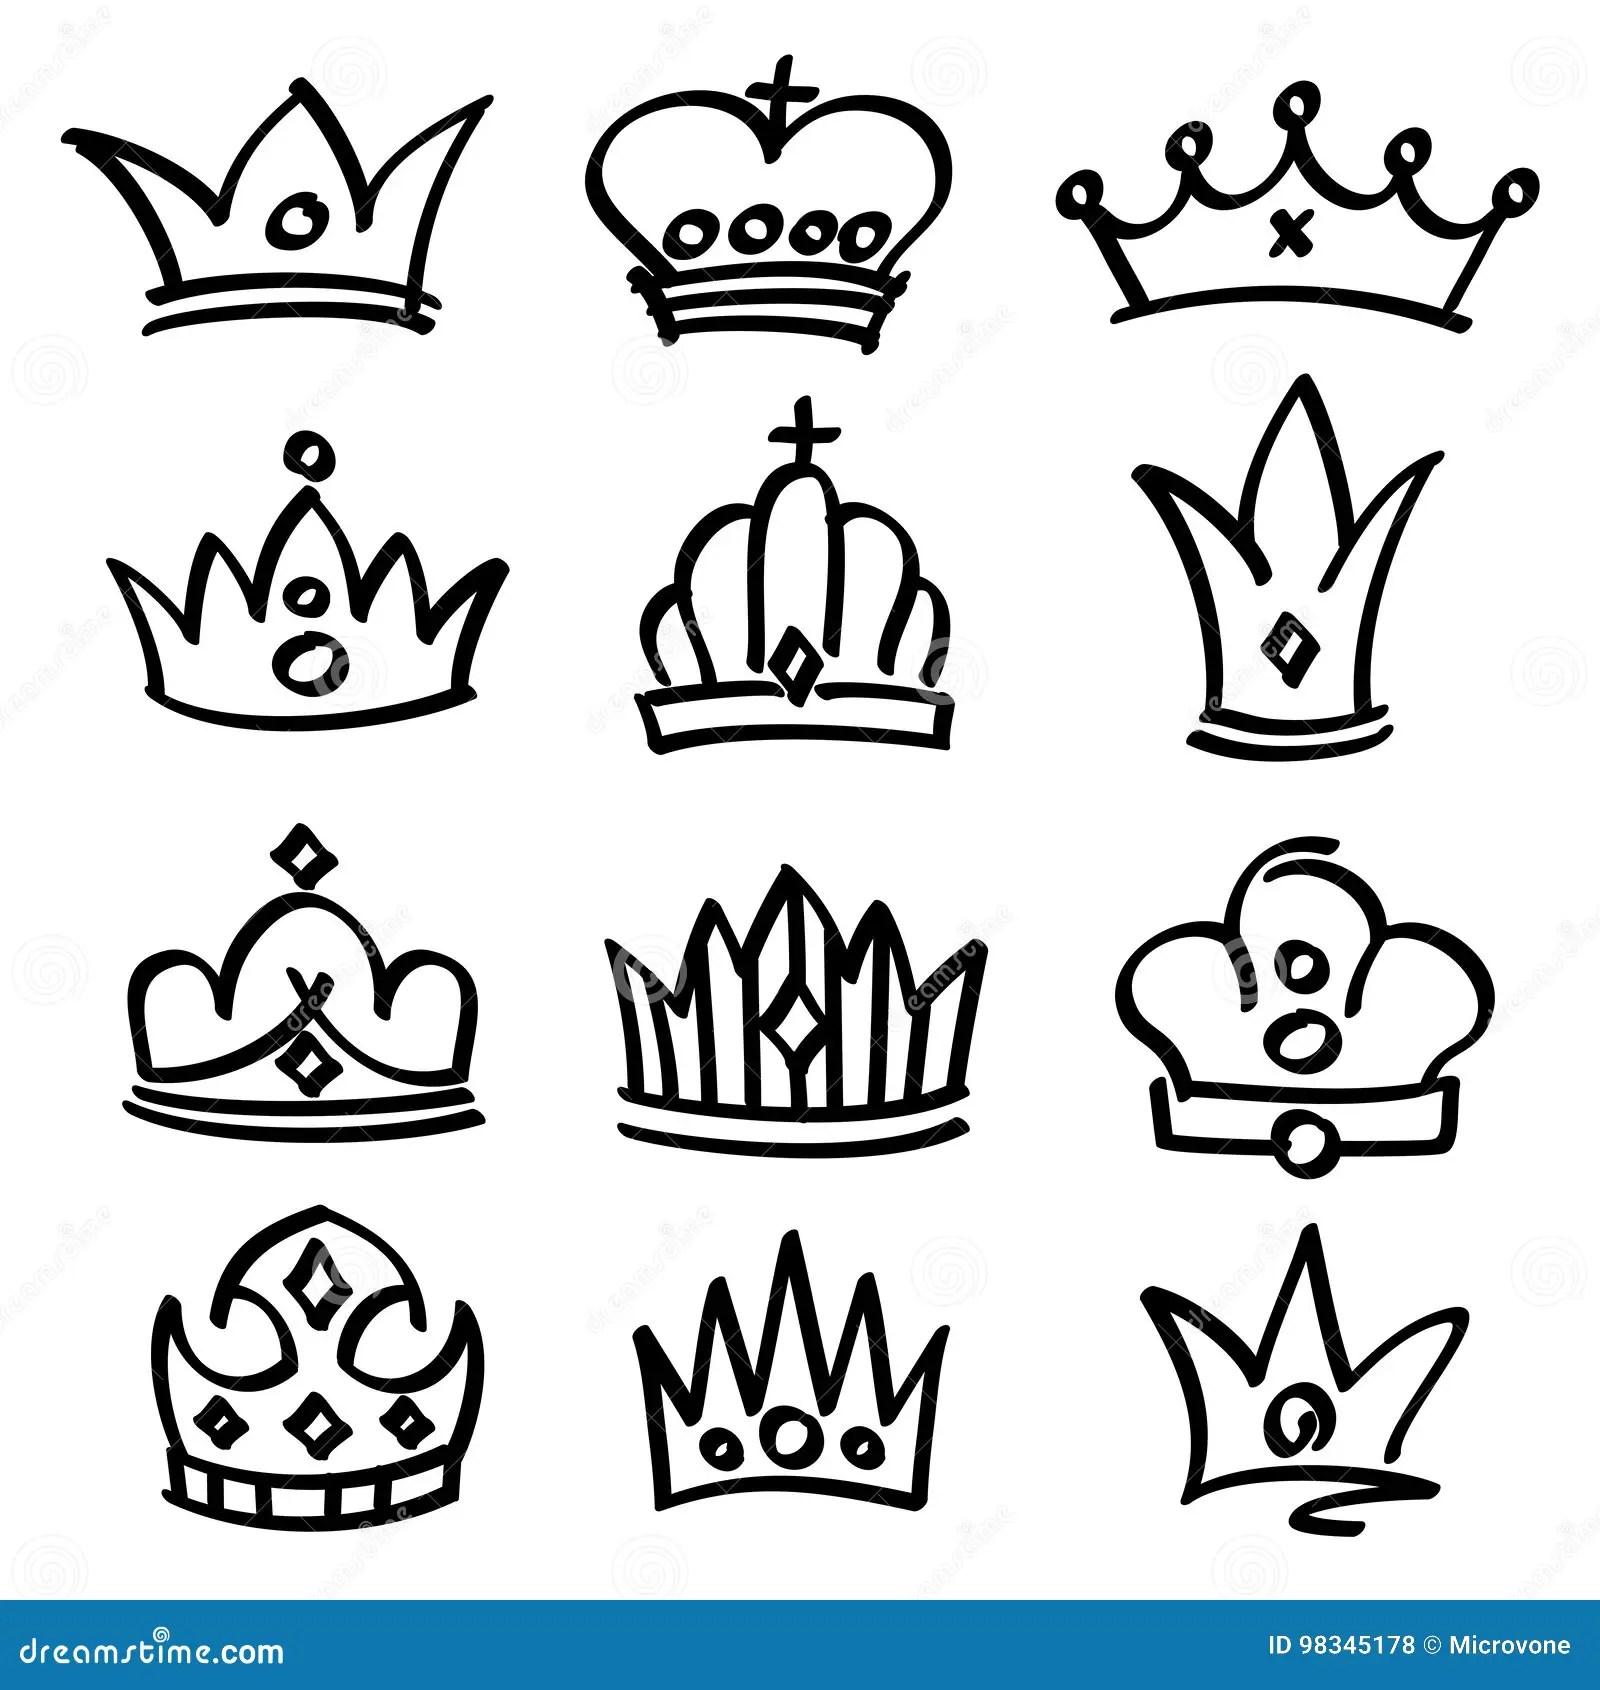 Vector Hand Drawn Princess Crowns Sketch Doodle Royalty